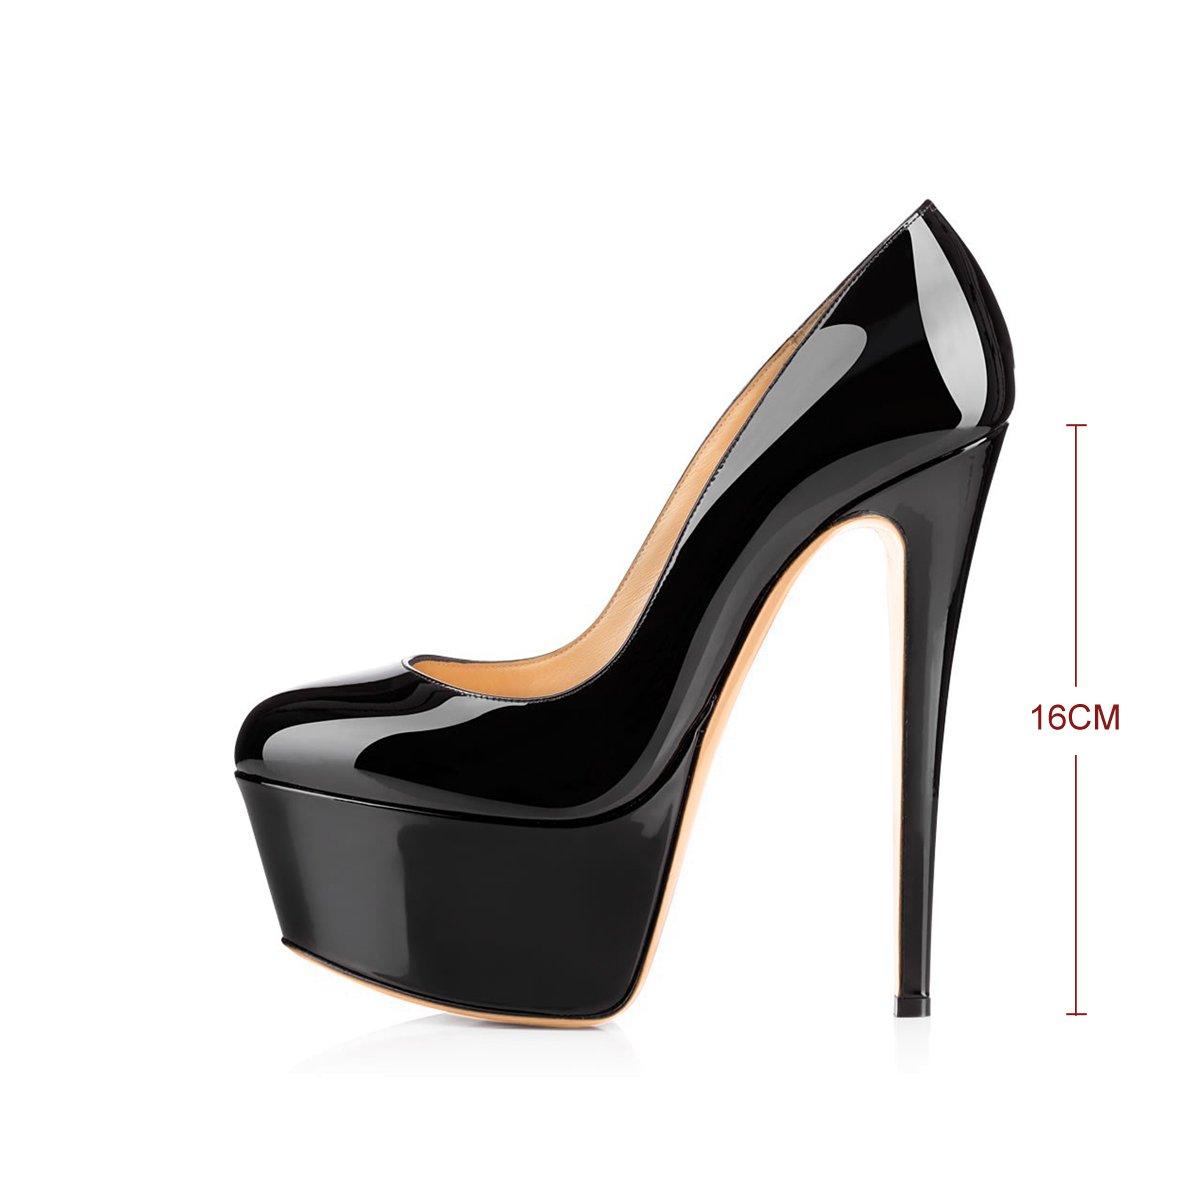 b7b7f1c5a9 Amazon.com   Joogo Women Round Toe Platform Pumps Stiletto High Heels Dress  Shoes   Pumps